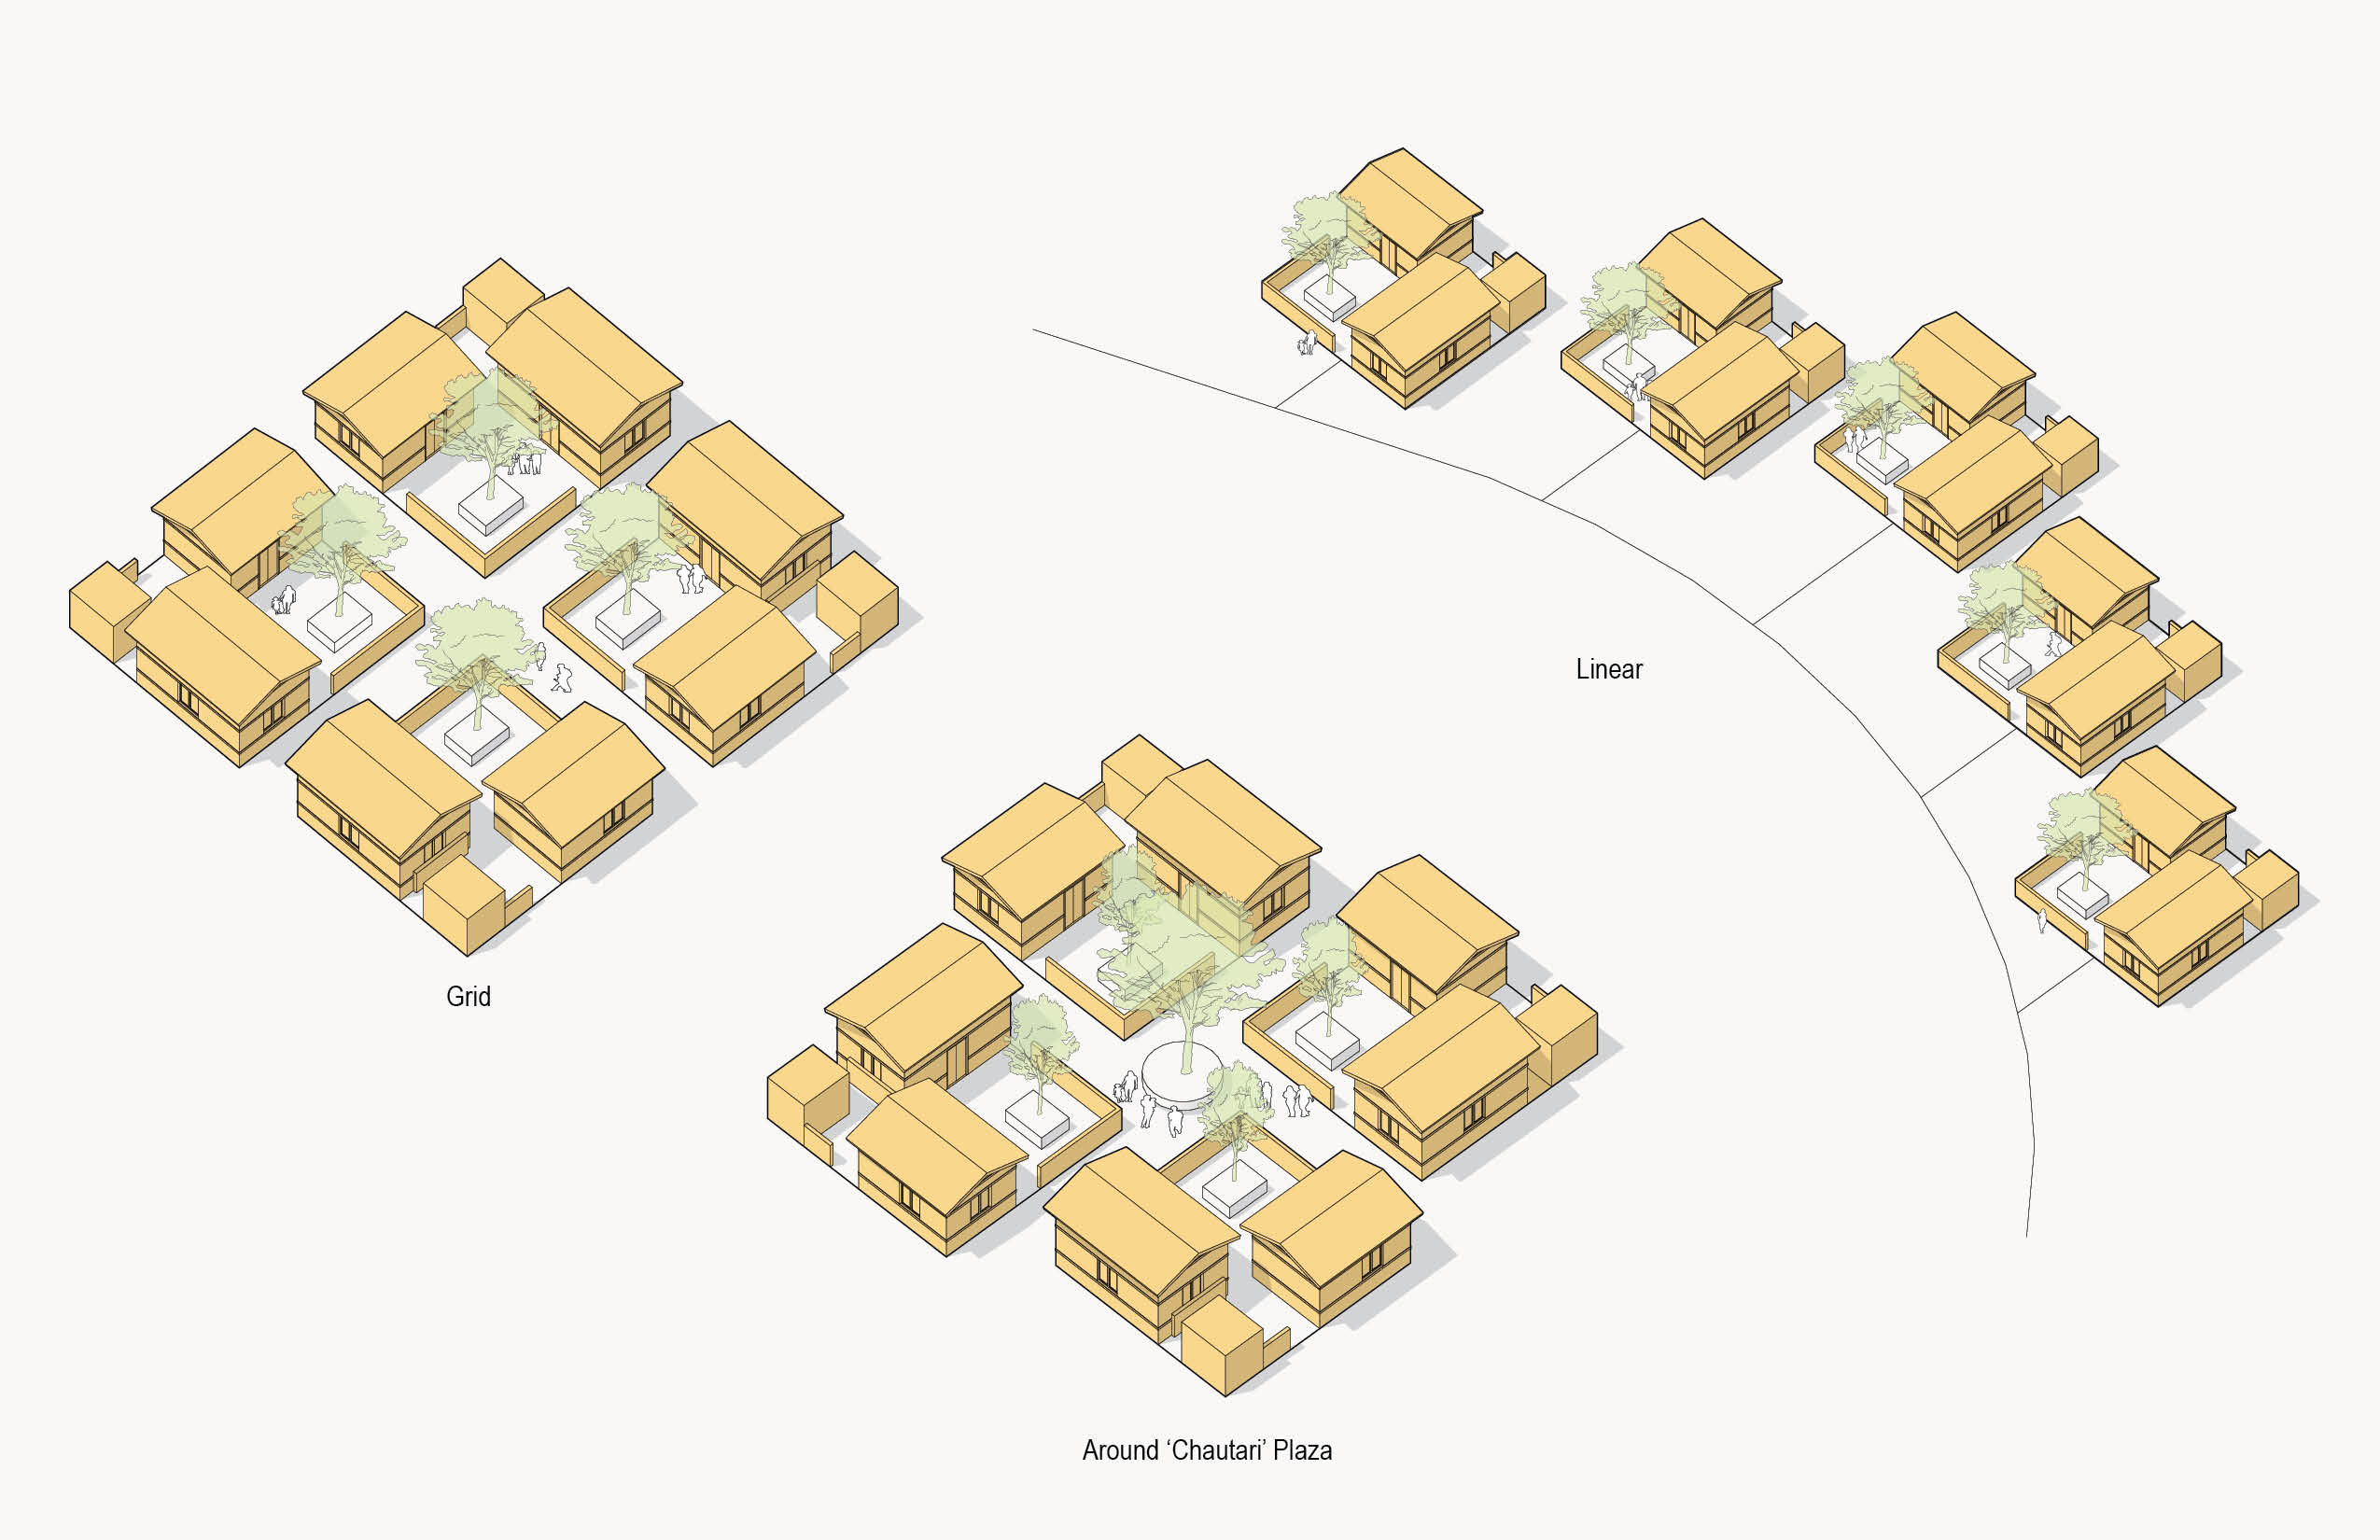 Conceptual image from Henriquez Partners showing housing distribution studies in Dalit community.